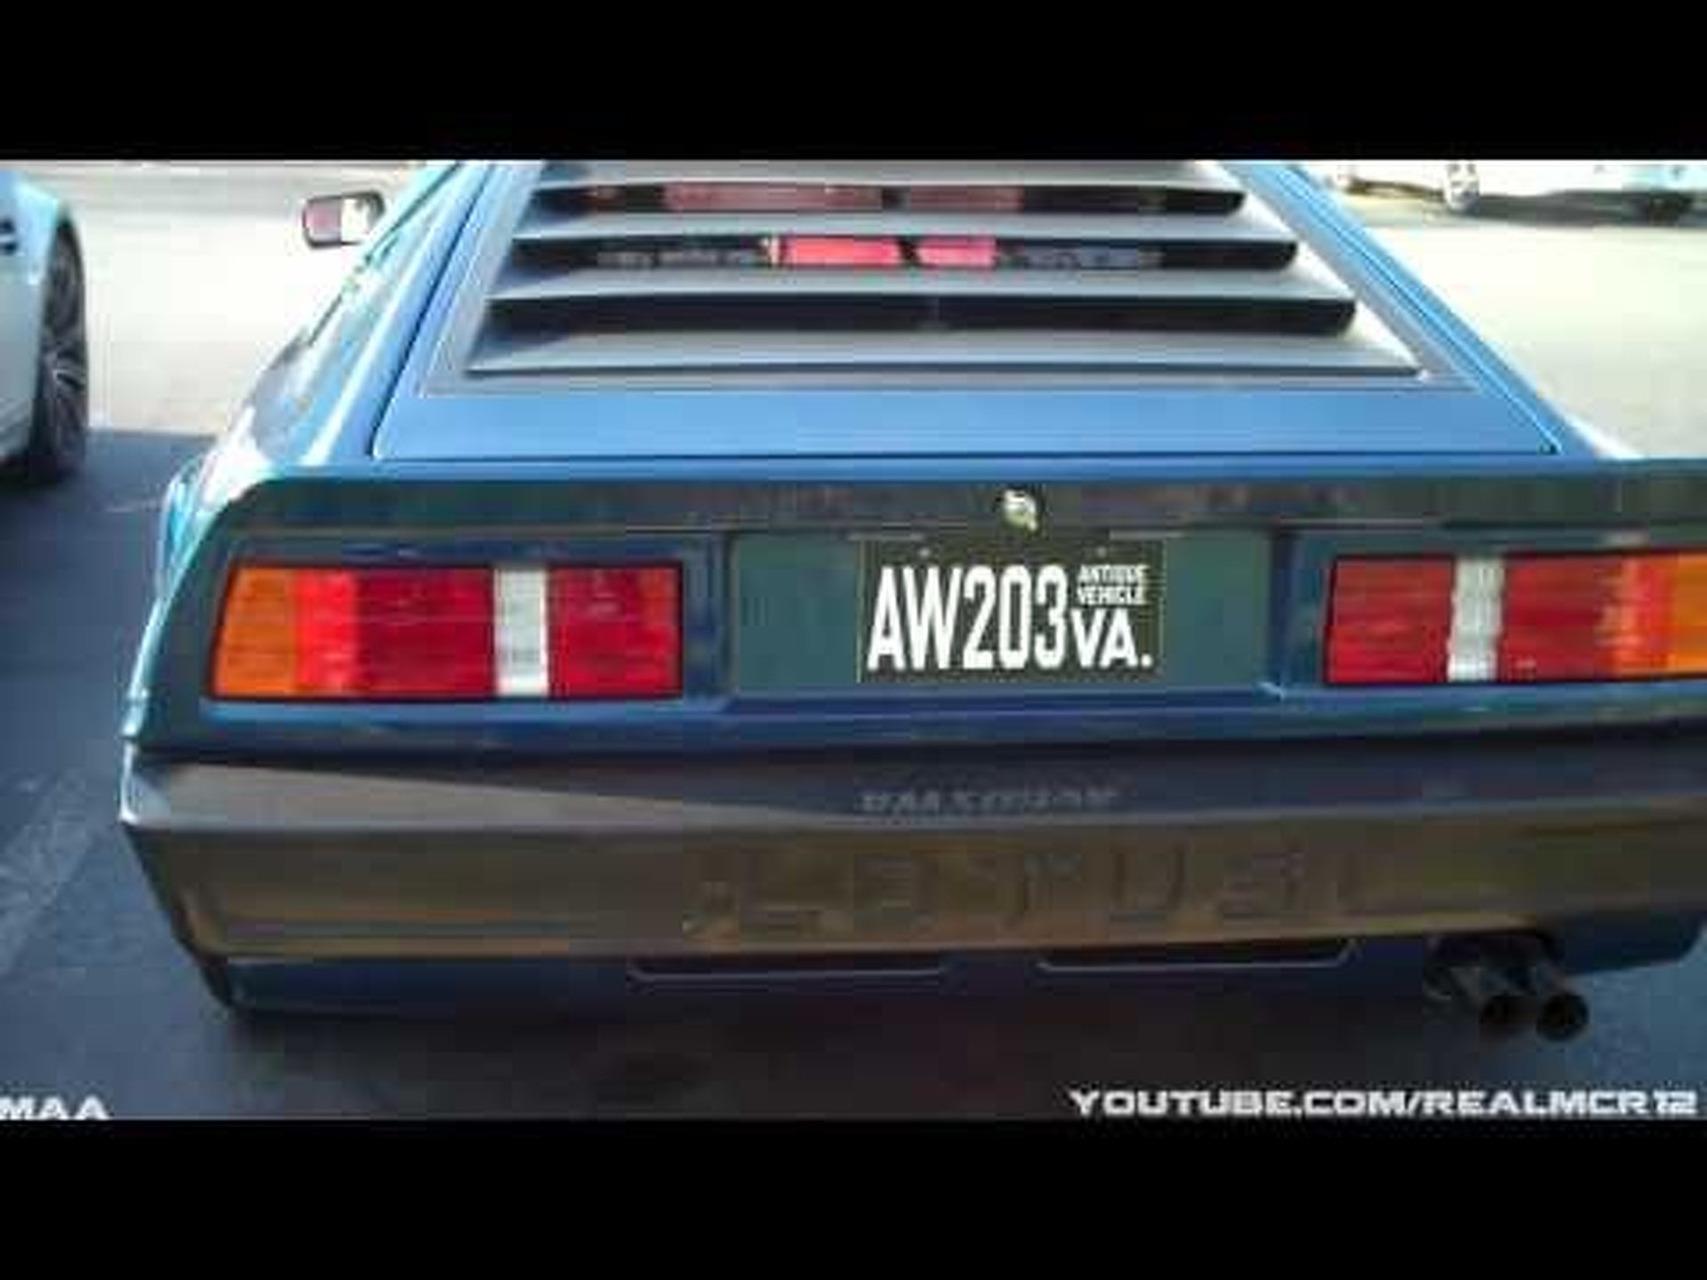 Lotus First Supercar: Lotus Essex Turbo Esprit @ Cars and Coffee